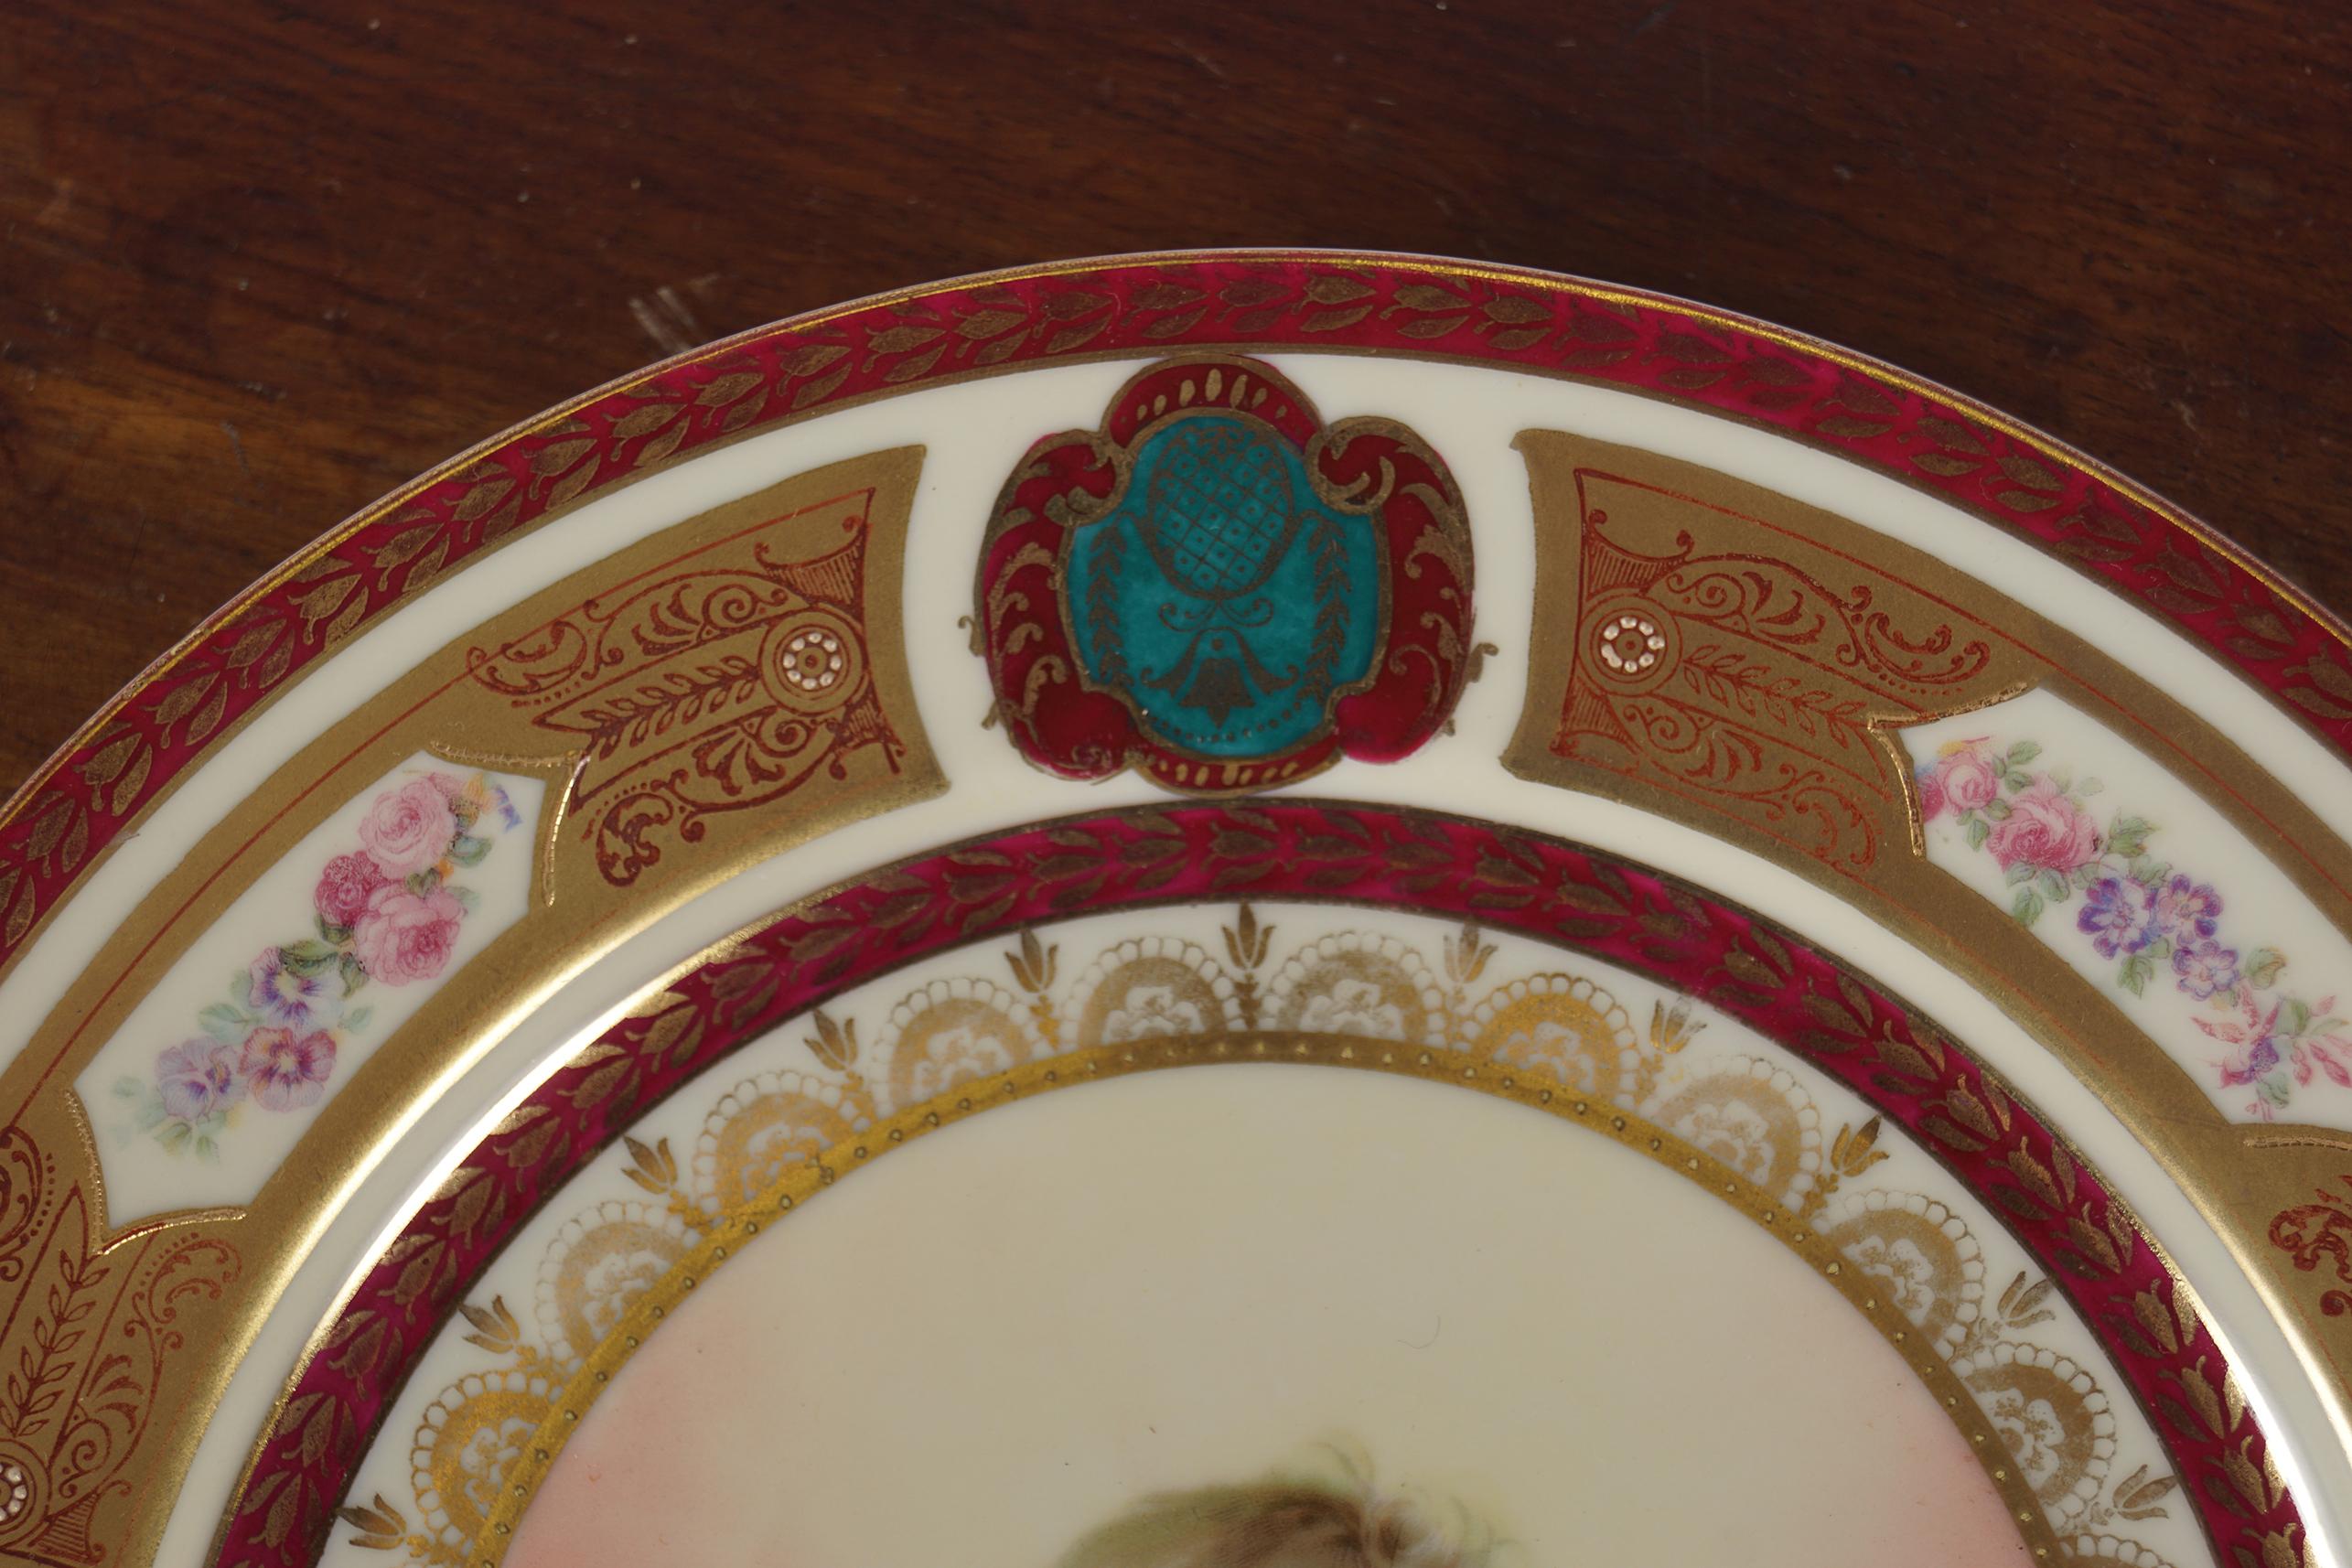 19TH-CENTURY SCHWARZ BURA PORCELAIN CABINET PLATE - Image 3 of 4